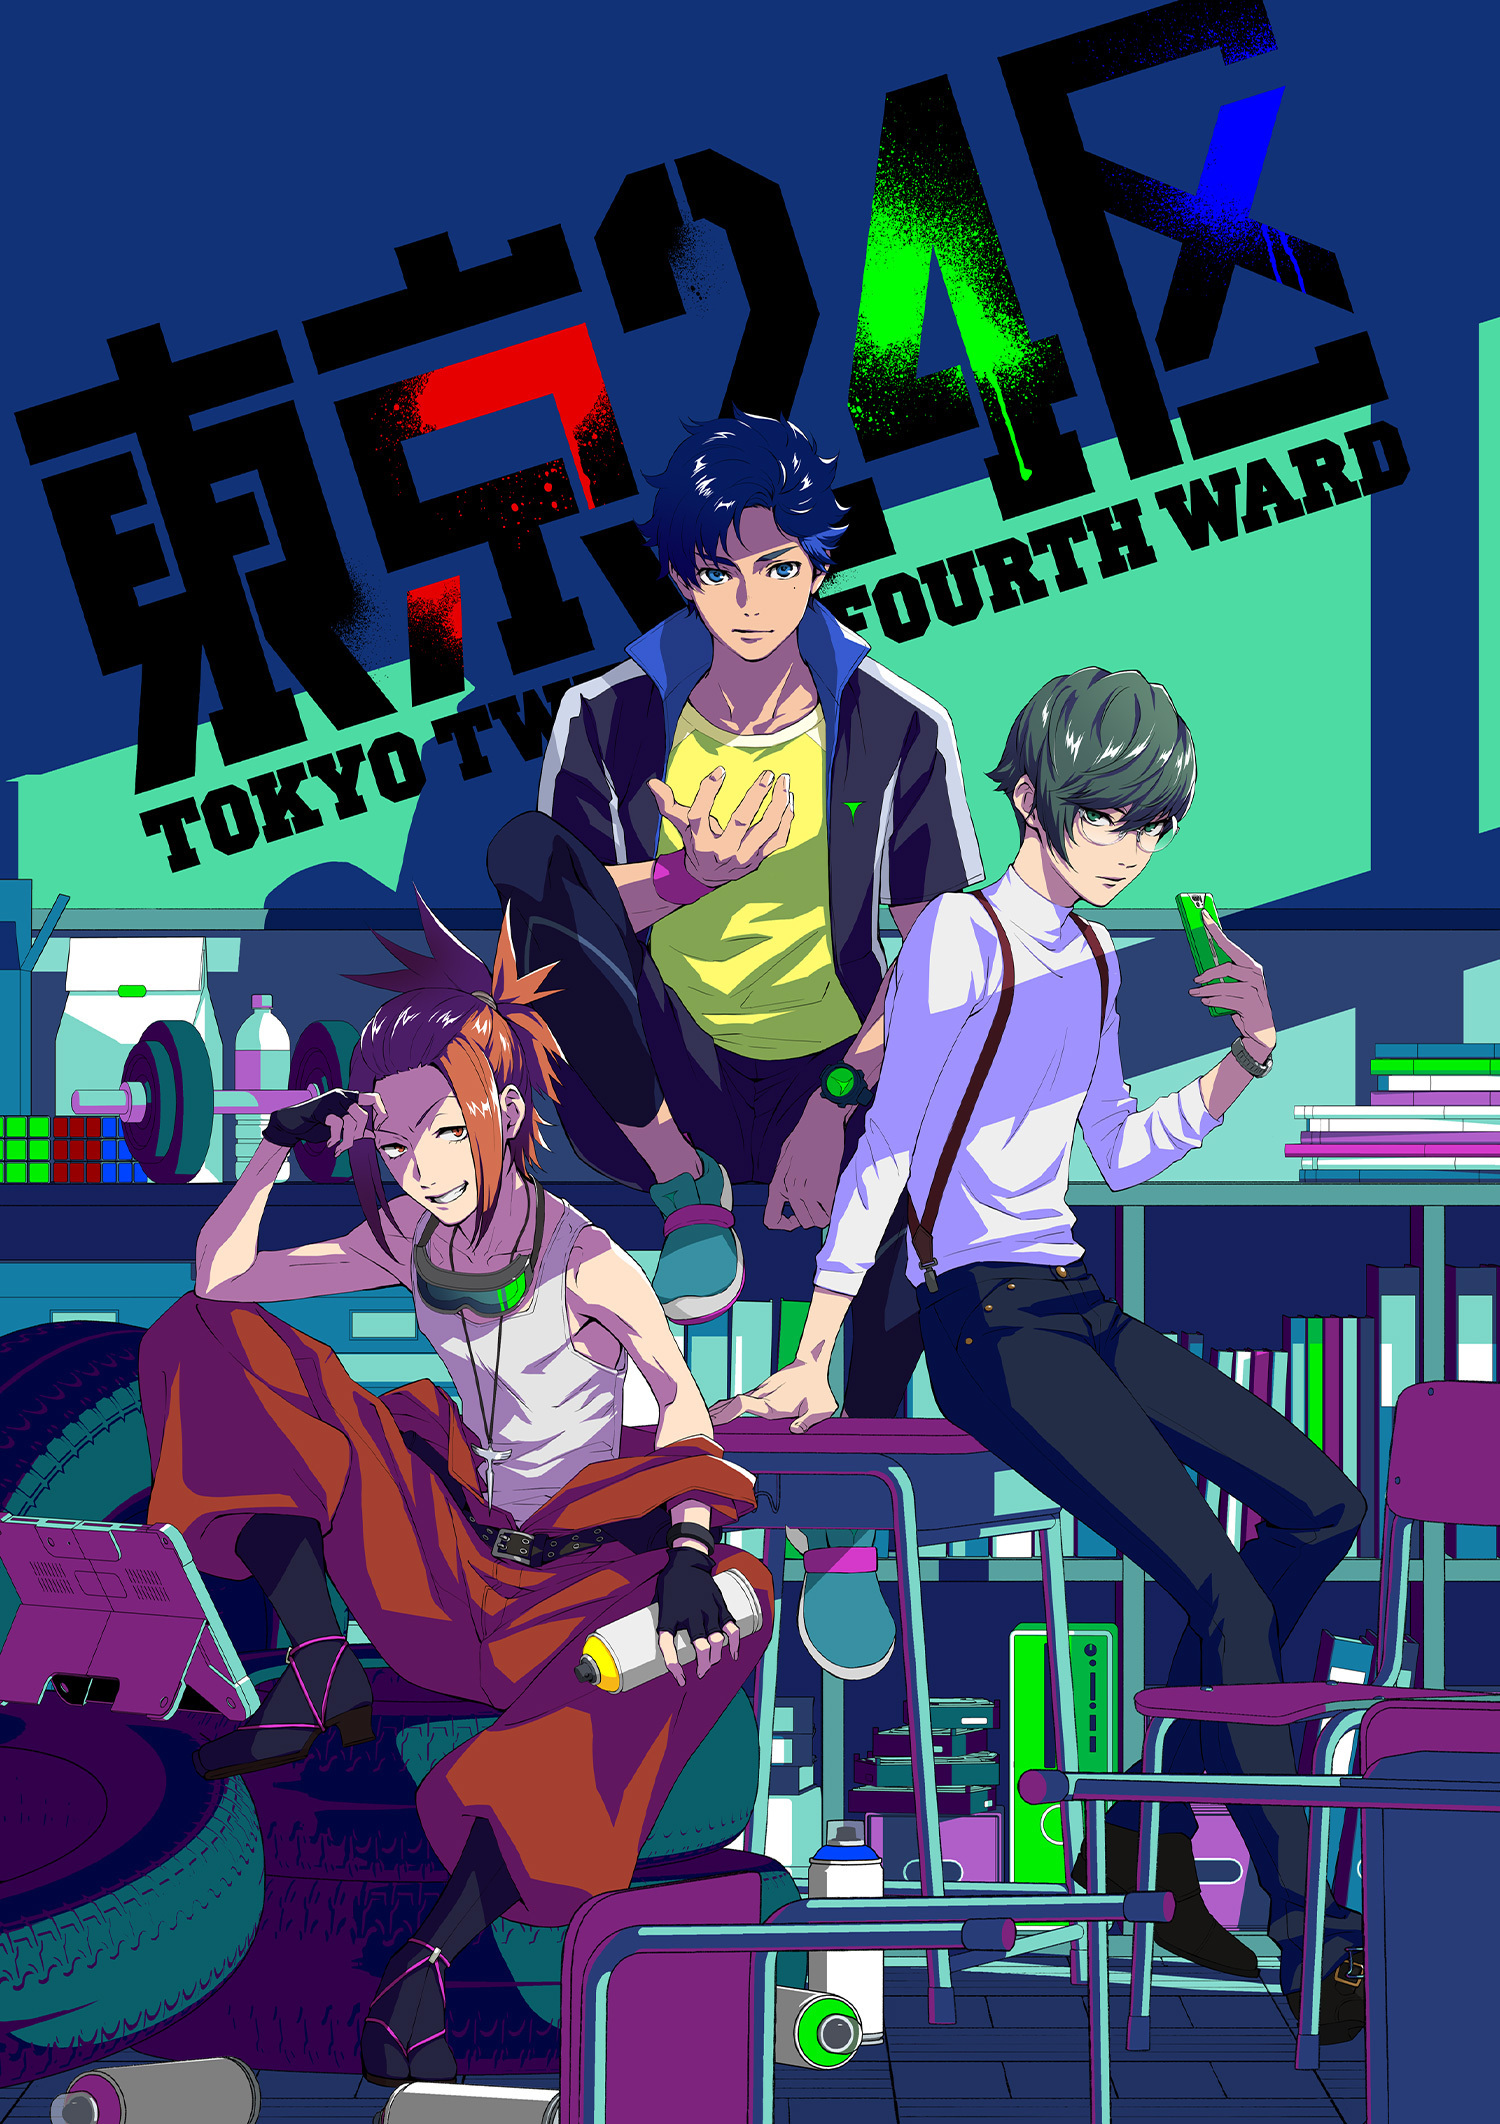 'TV动画《东京24区》预告PV及视觉图公开,将于2022年1月播出'的缩略图